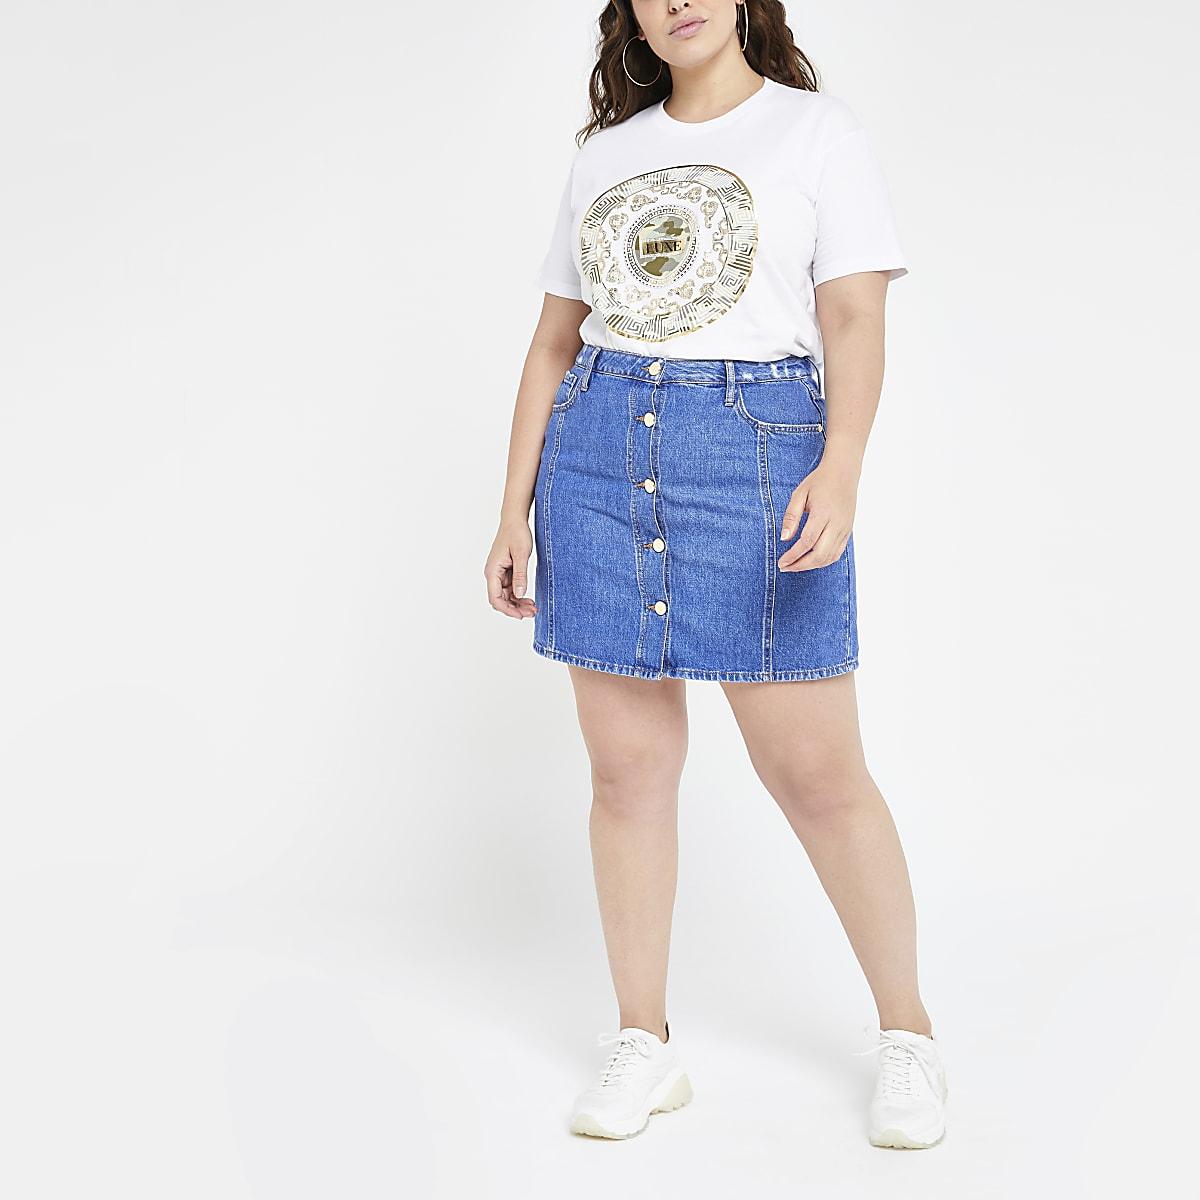 Plus – Blauer Mini-Jeansrock mit Knopfverschluss